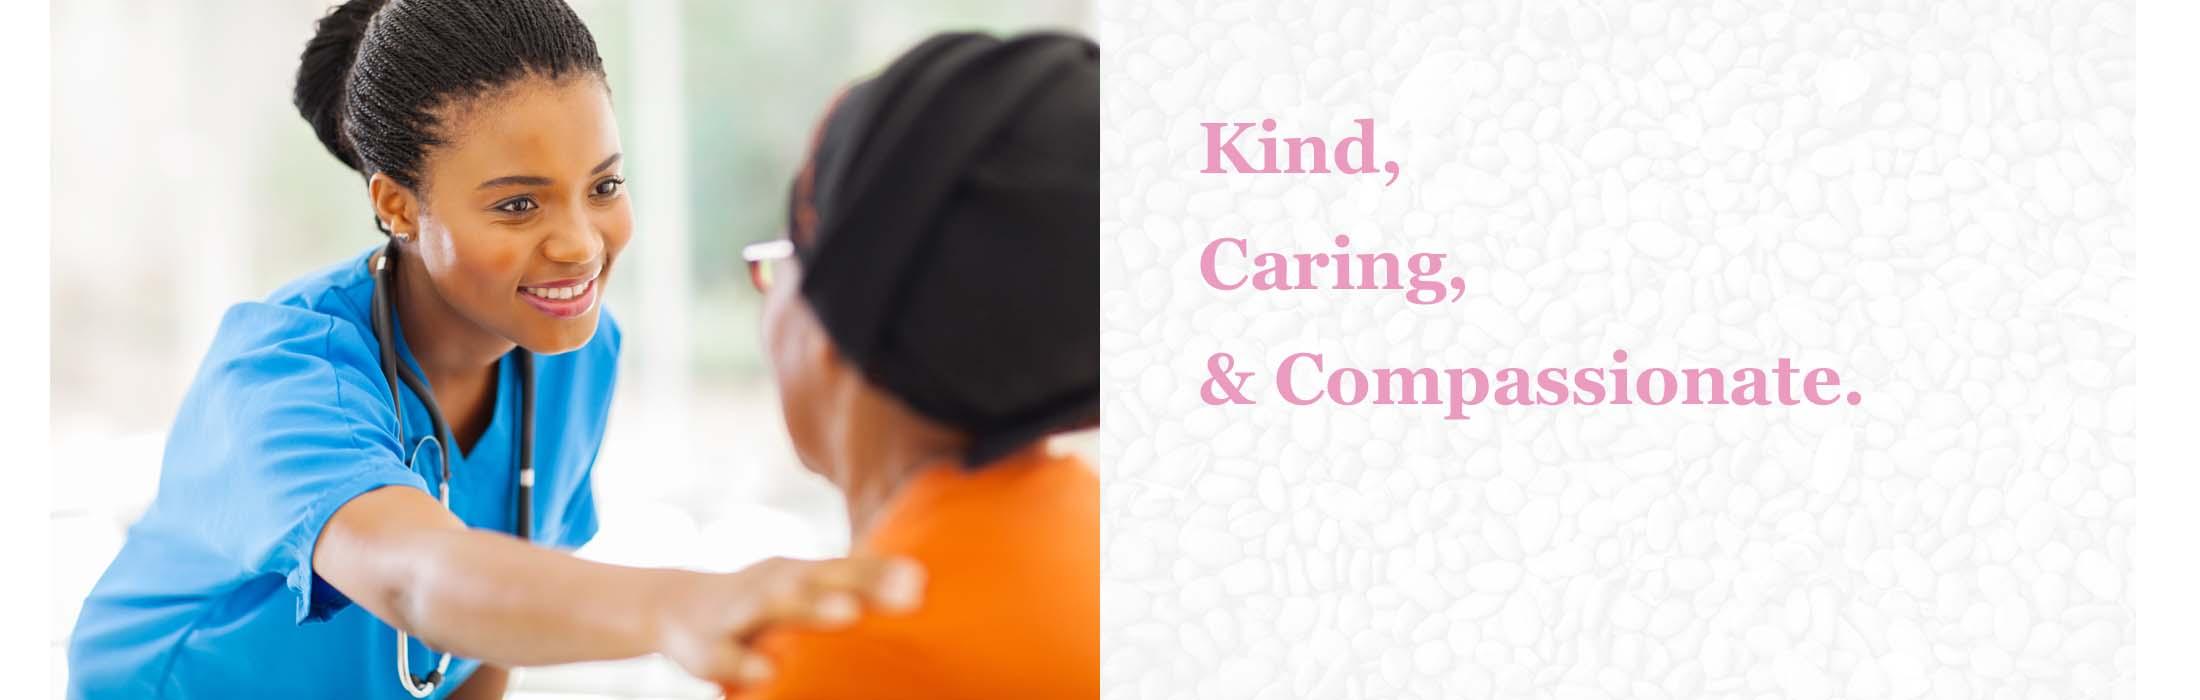 Kind Caring & Compassionate.